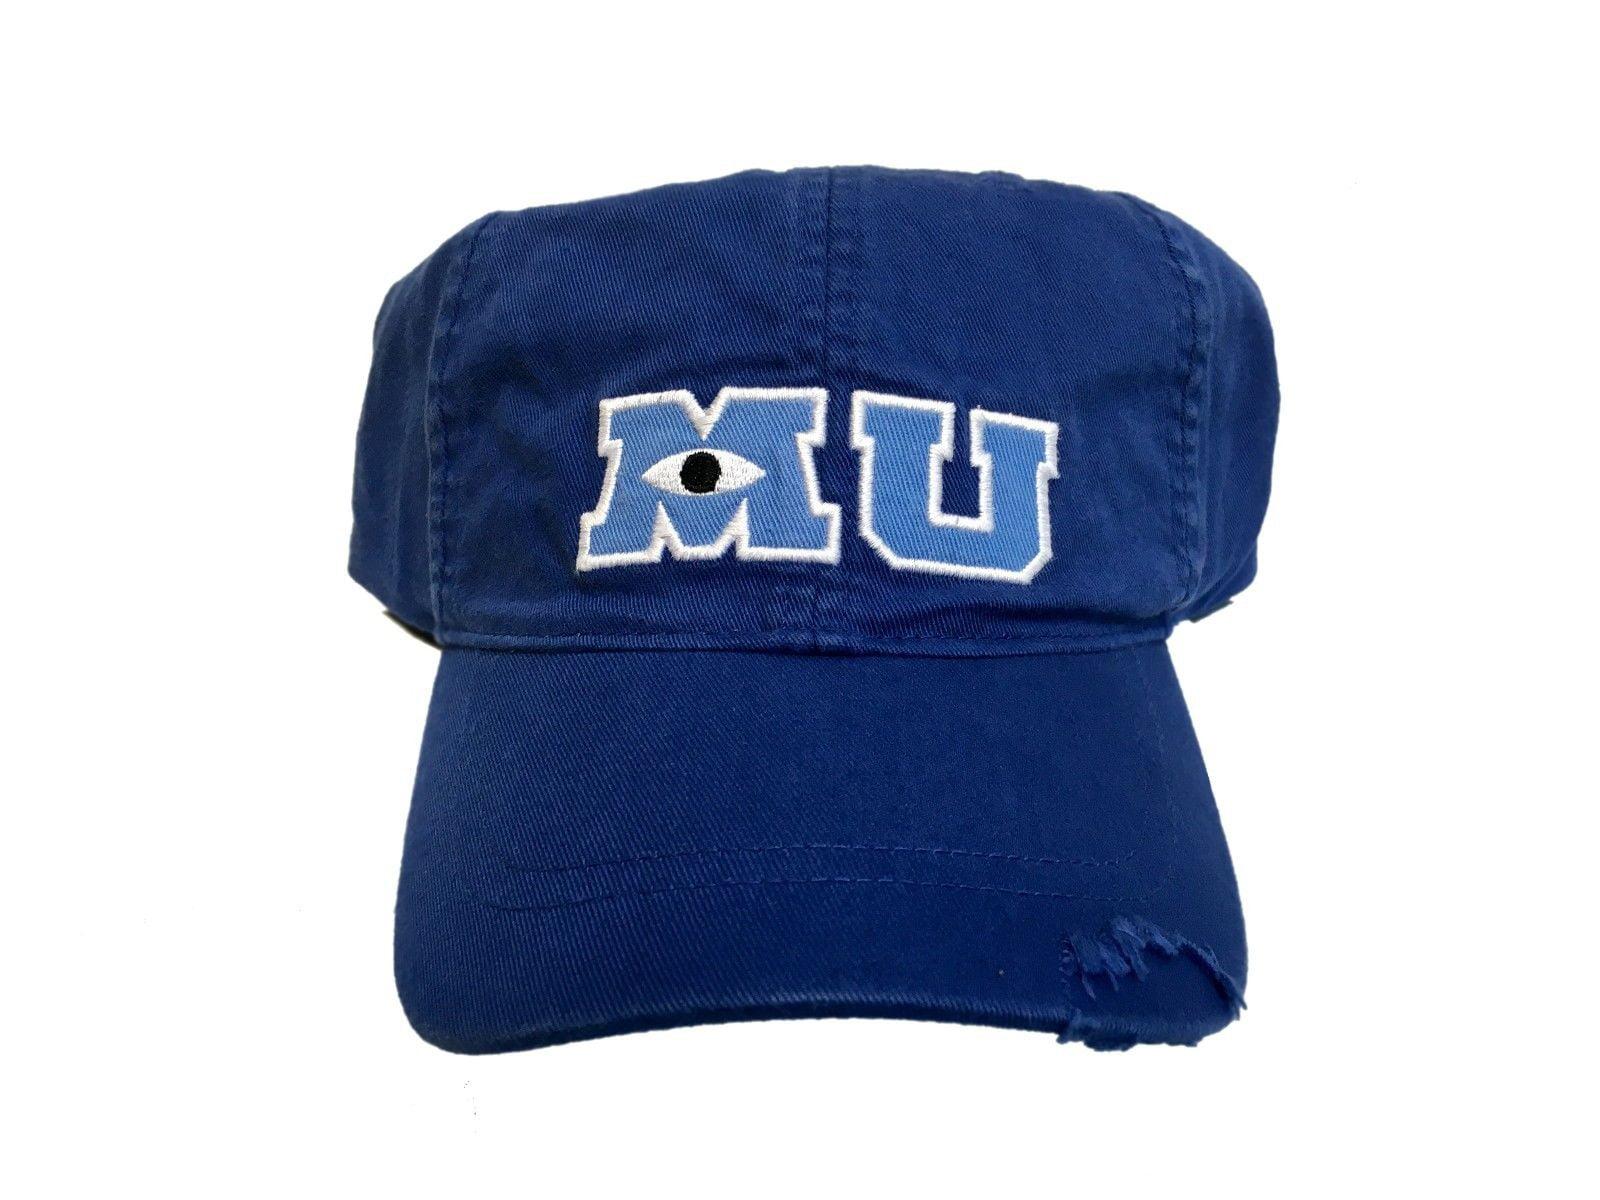 Disney - Disney Parks M U Monsters University Adult Size Baseball Hat Cap -  Walmart.com 2a27a1f2307